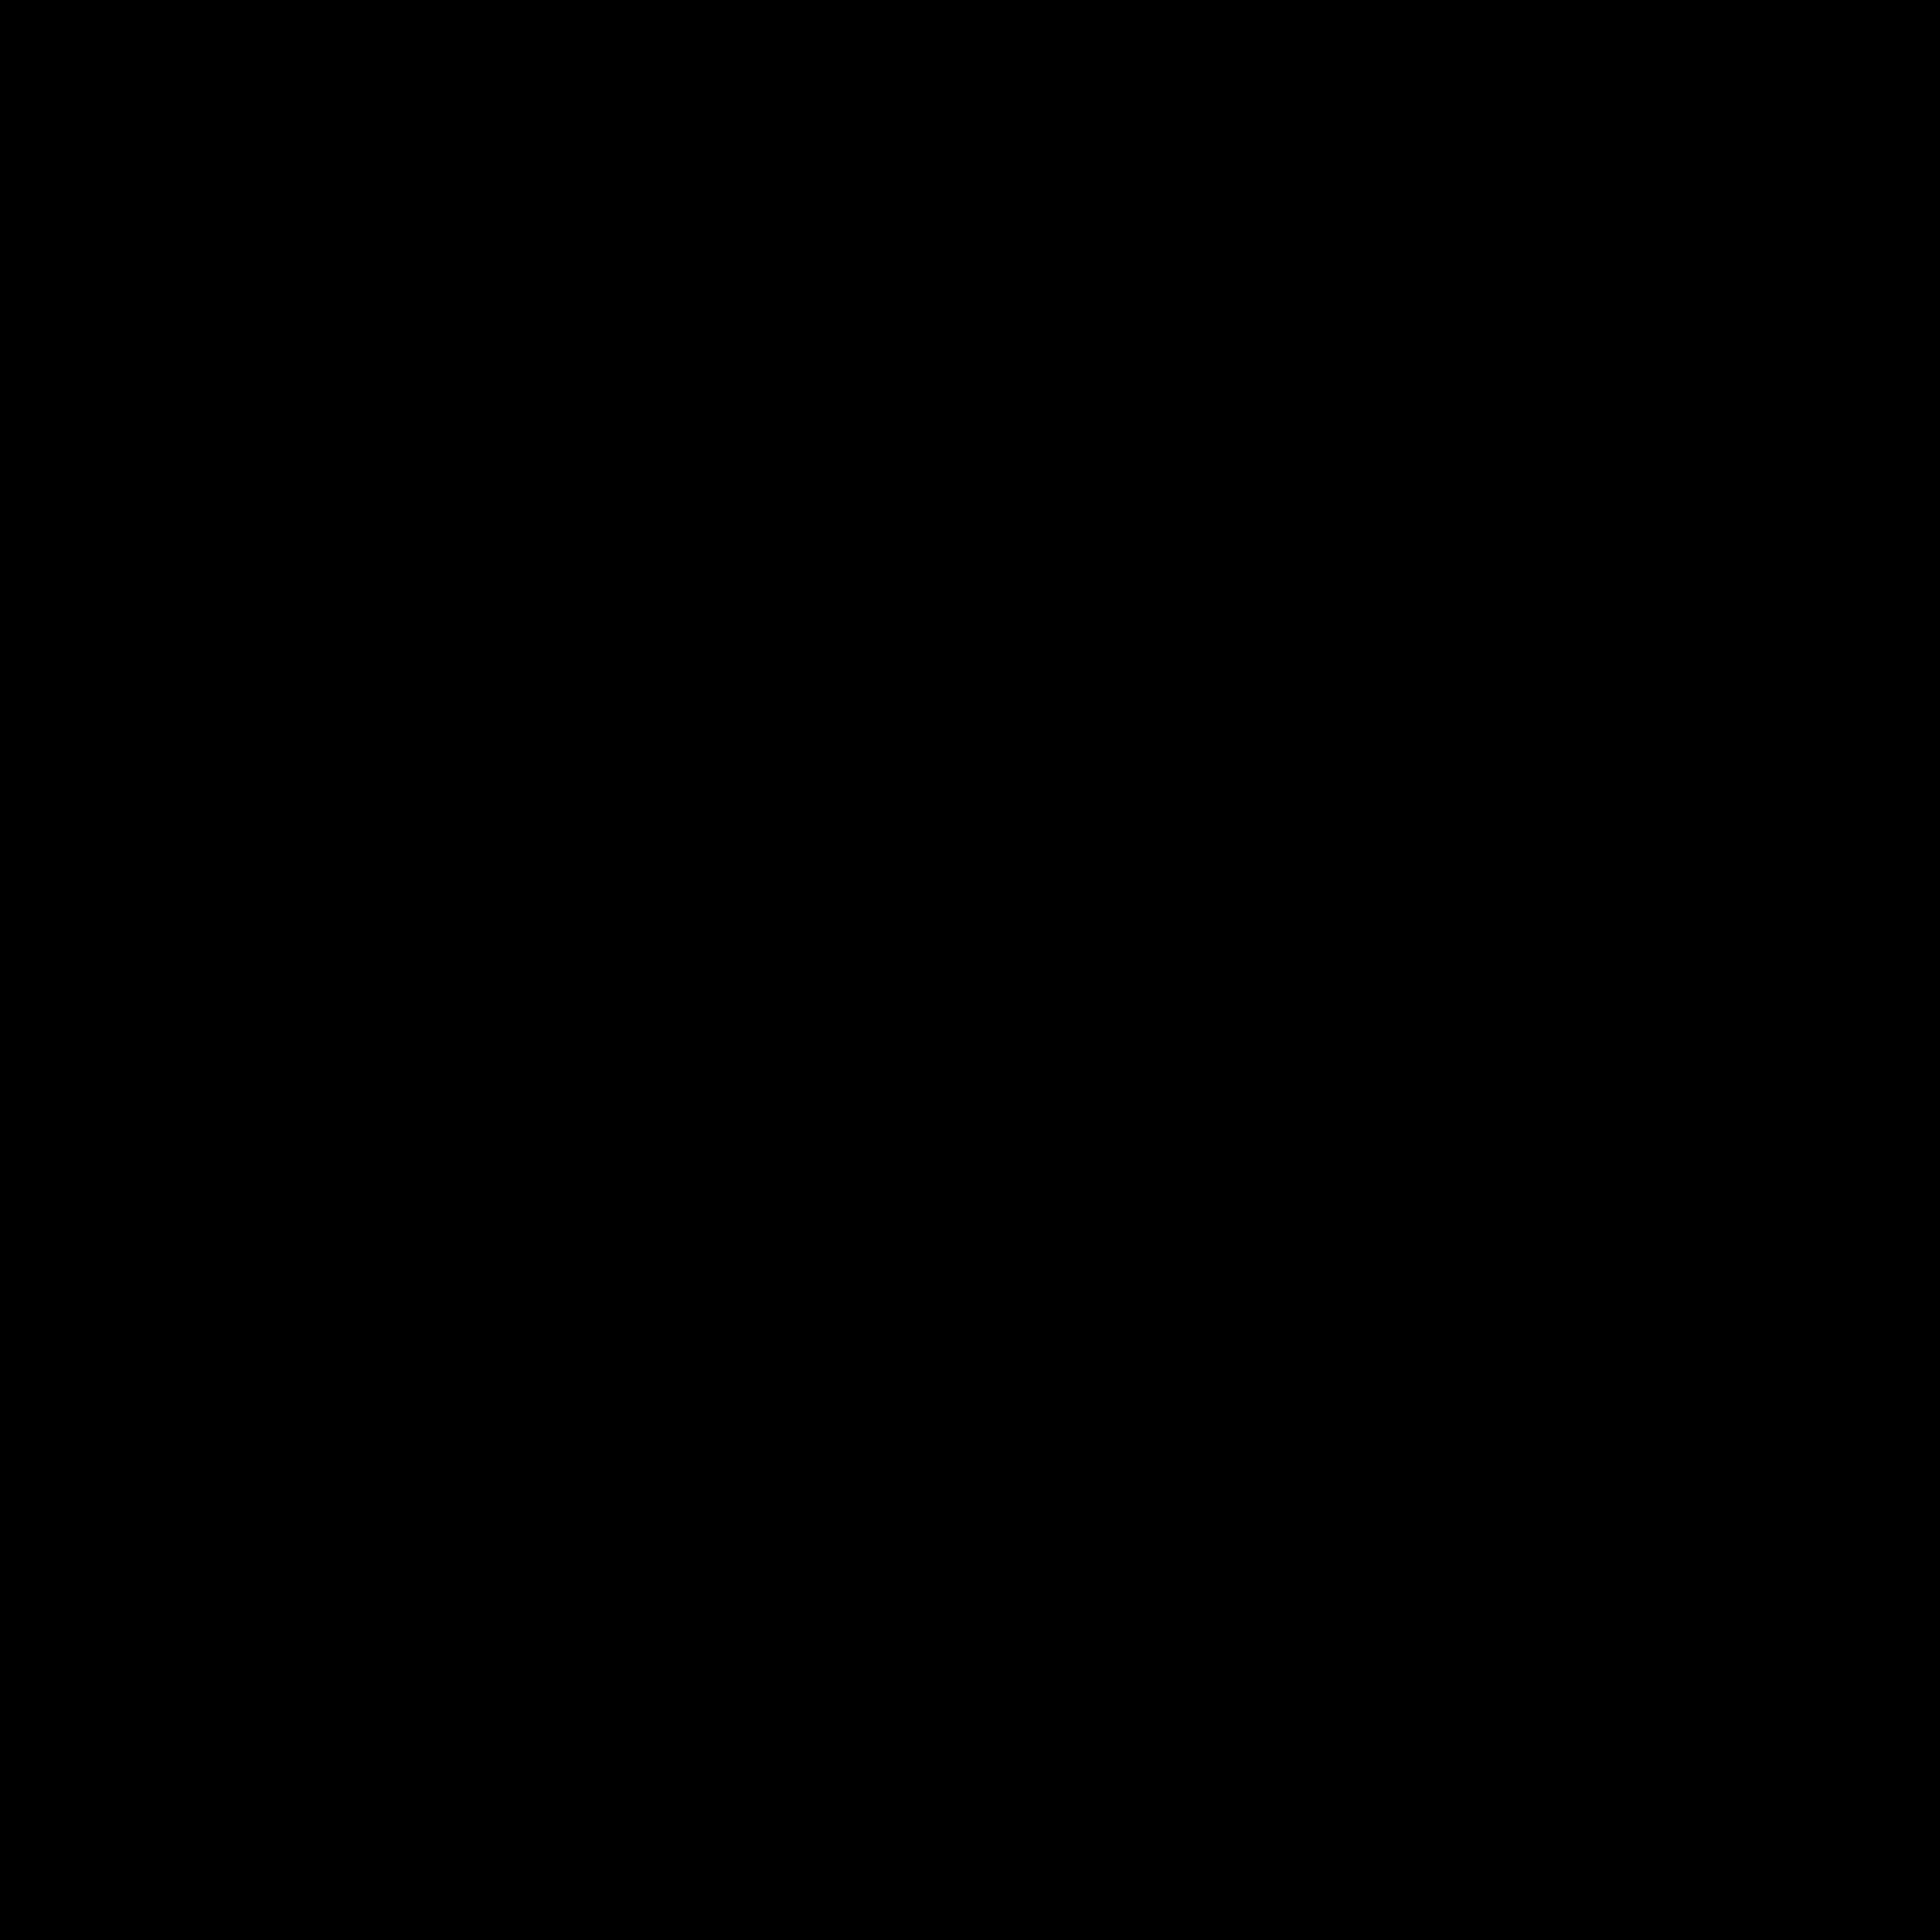 Recyling Symbol.